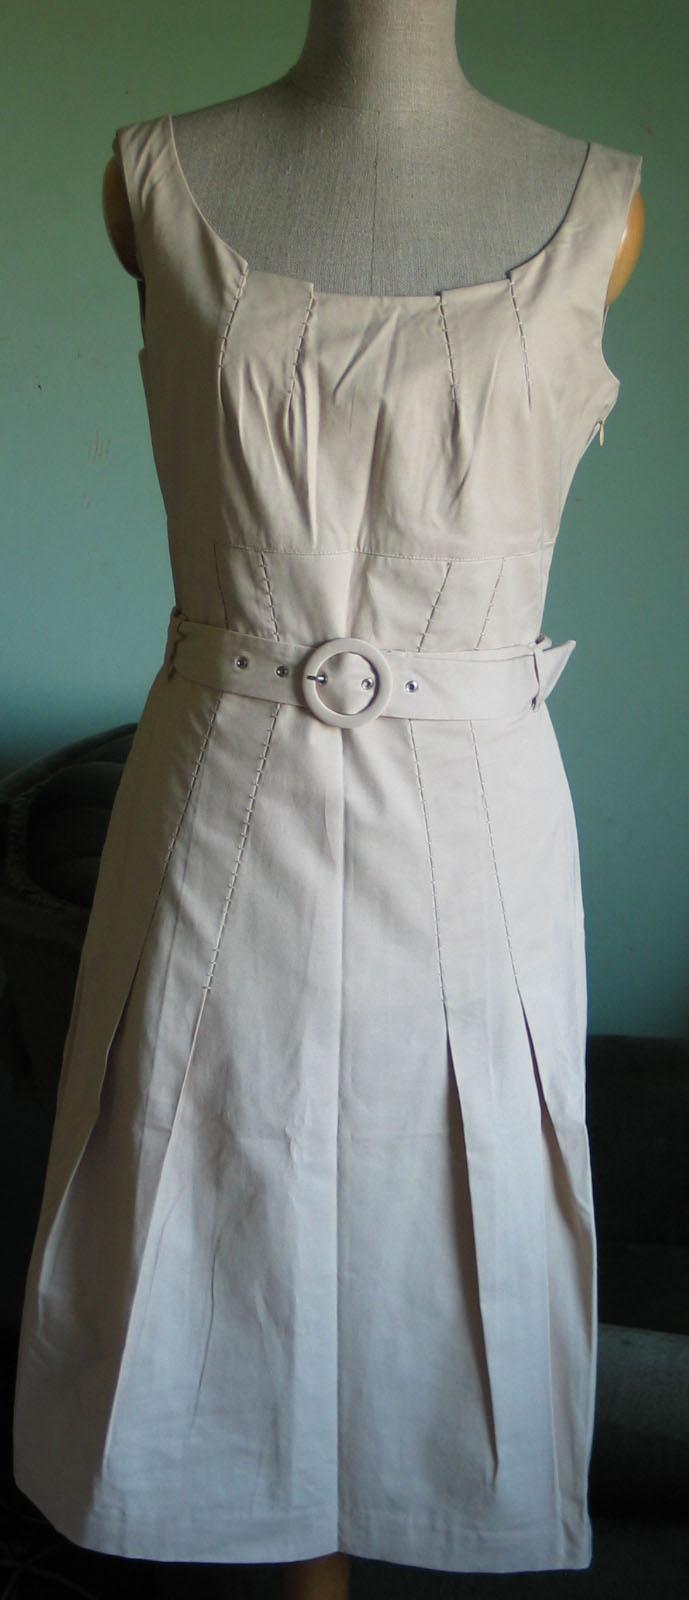 0cfd0272b4 nowa sukienka Monnari r. 38 - 7301995516 - oficjalne archiwum allegro